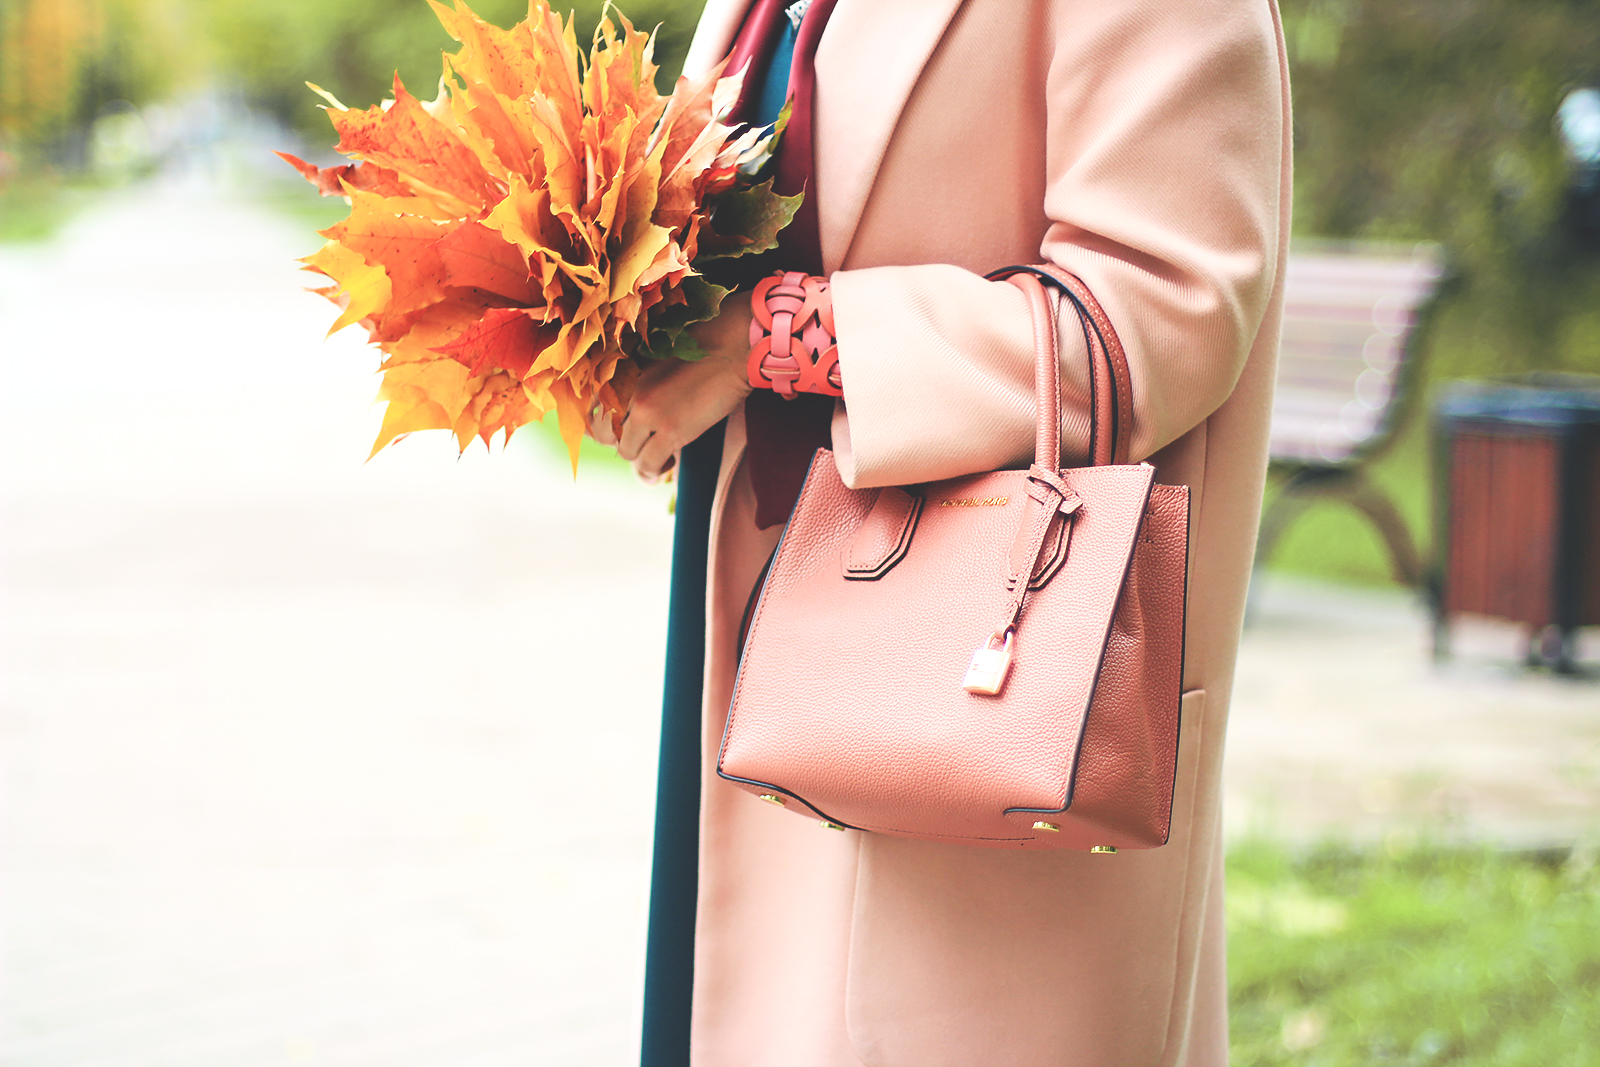 margarita_maslova_pink_coat_fall_colors_look_autumn_green_beret8